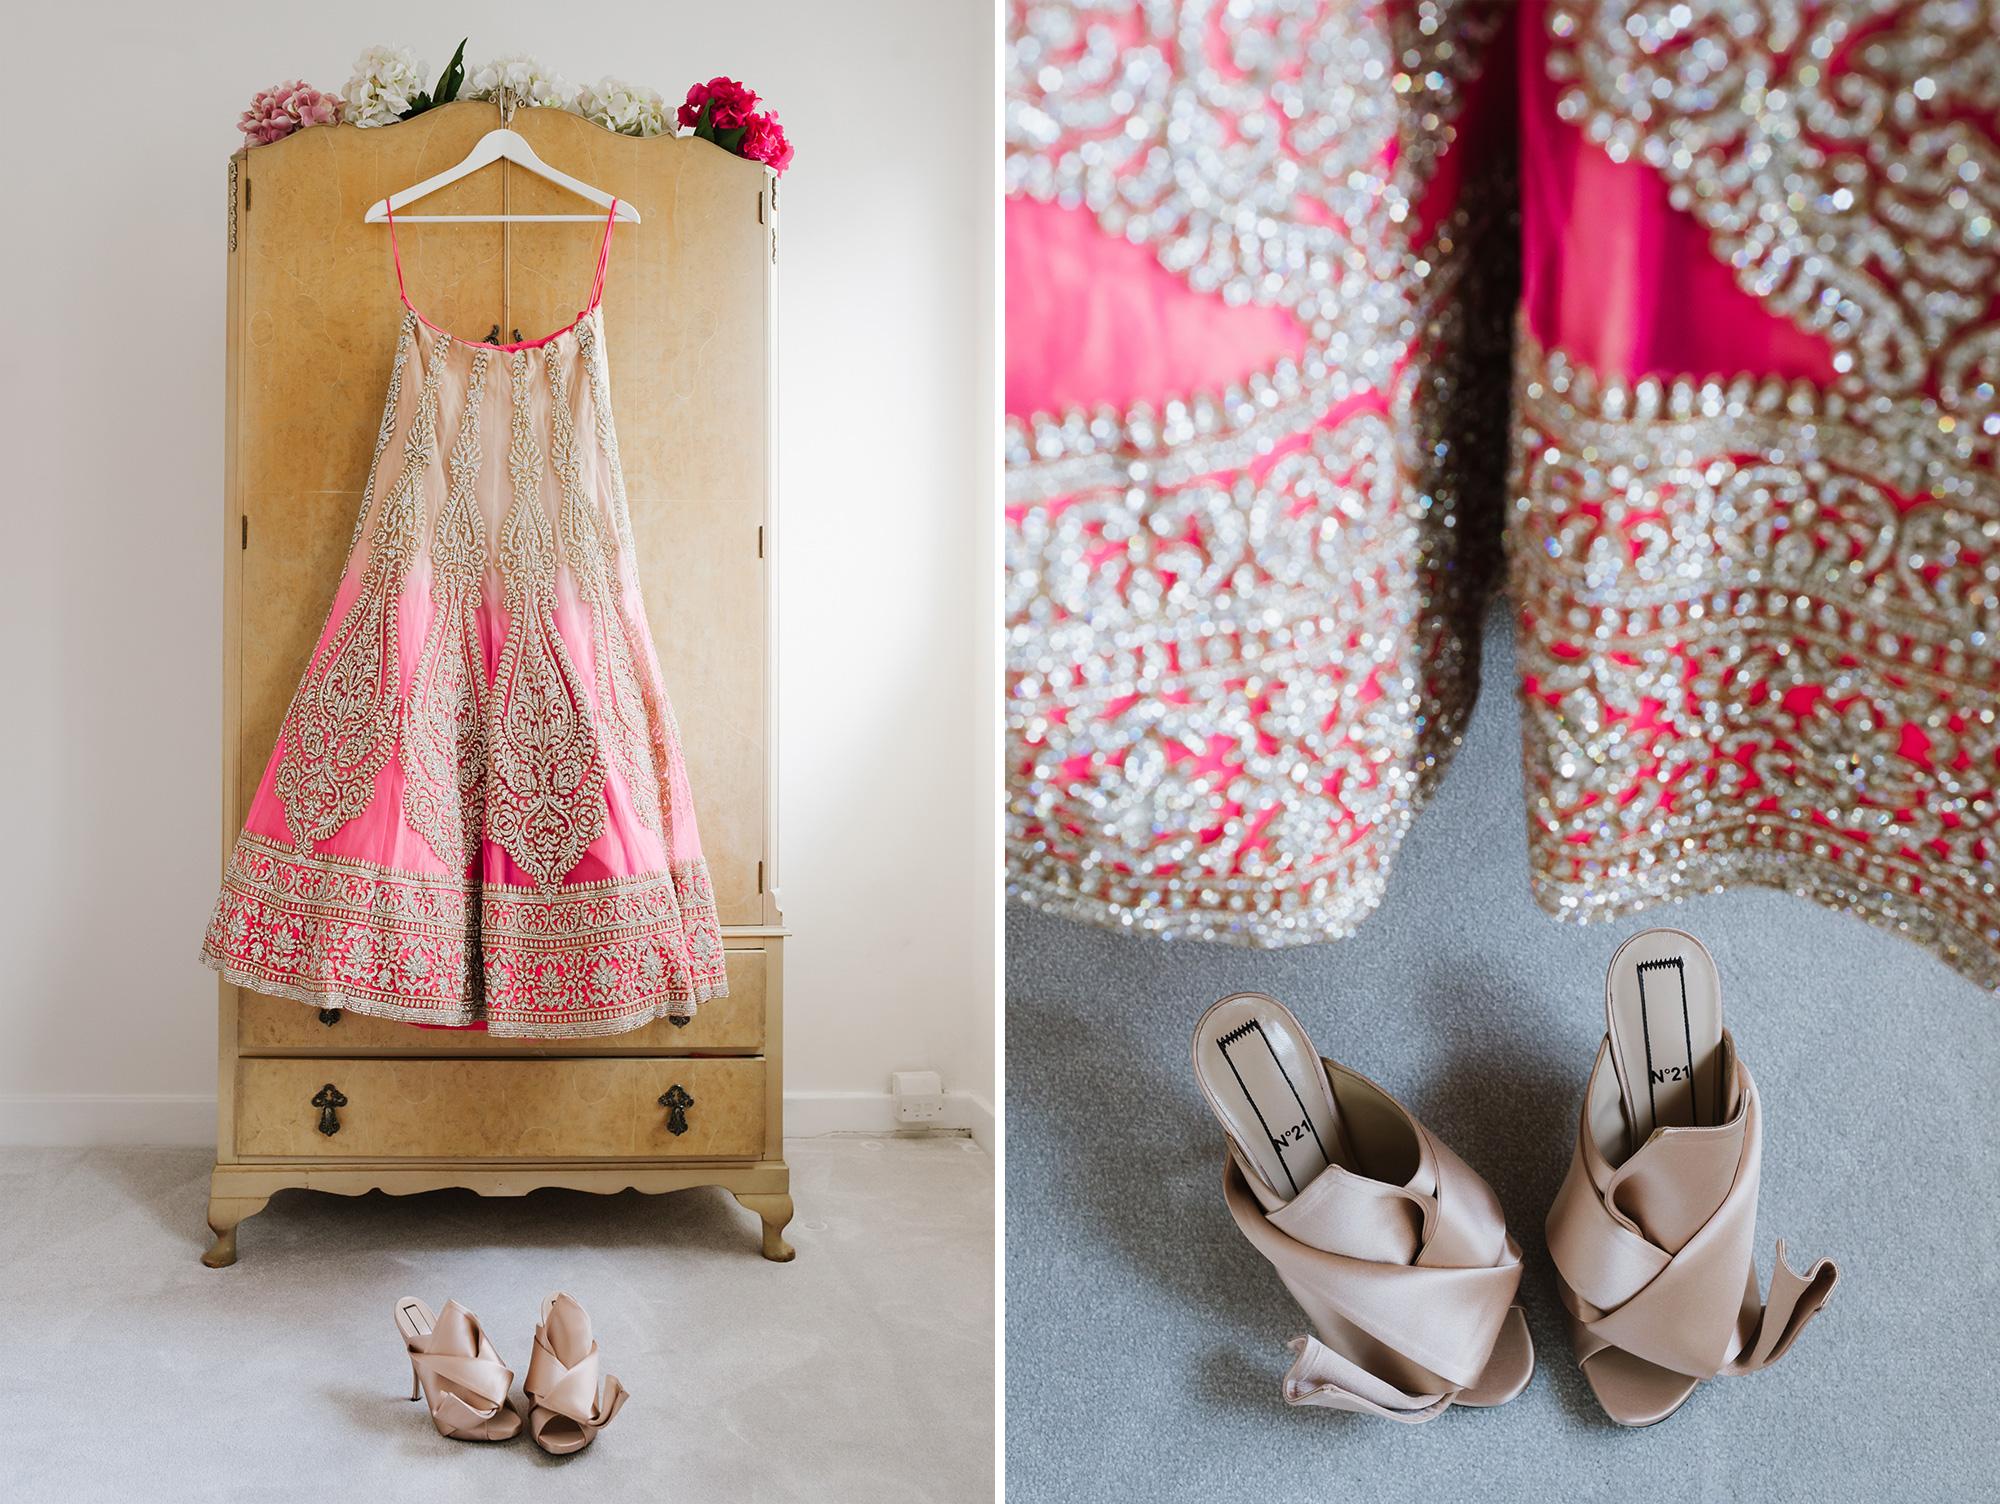 Indian Wedding Bride Getting Ready Sari Solihull